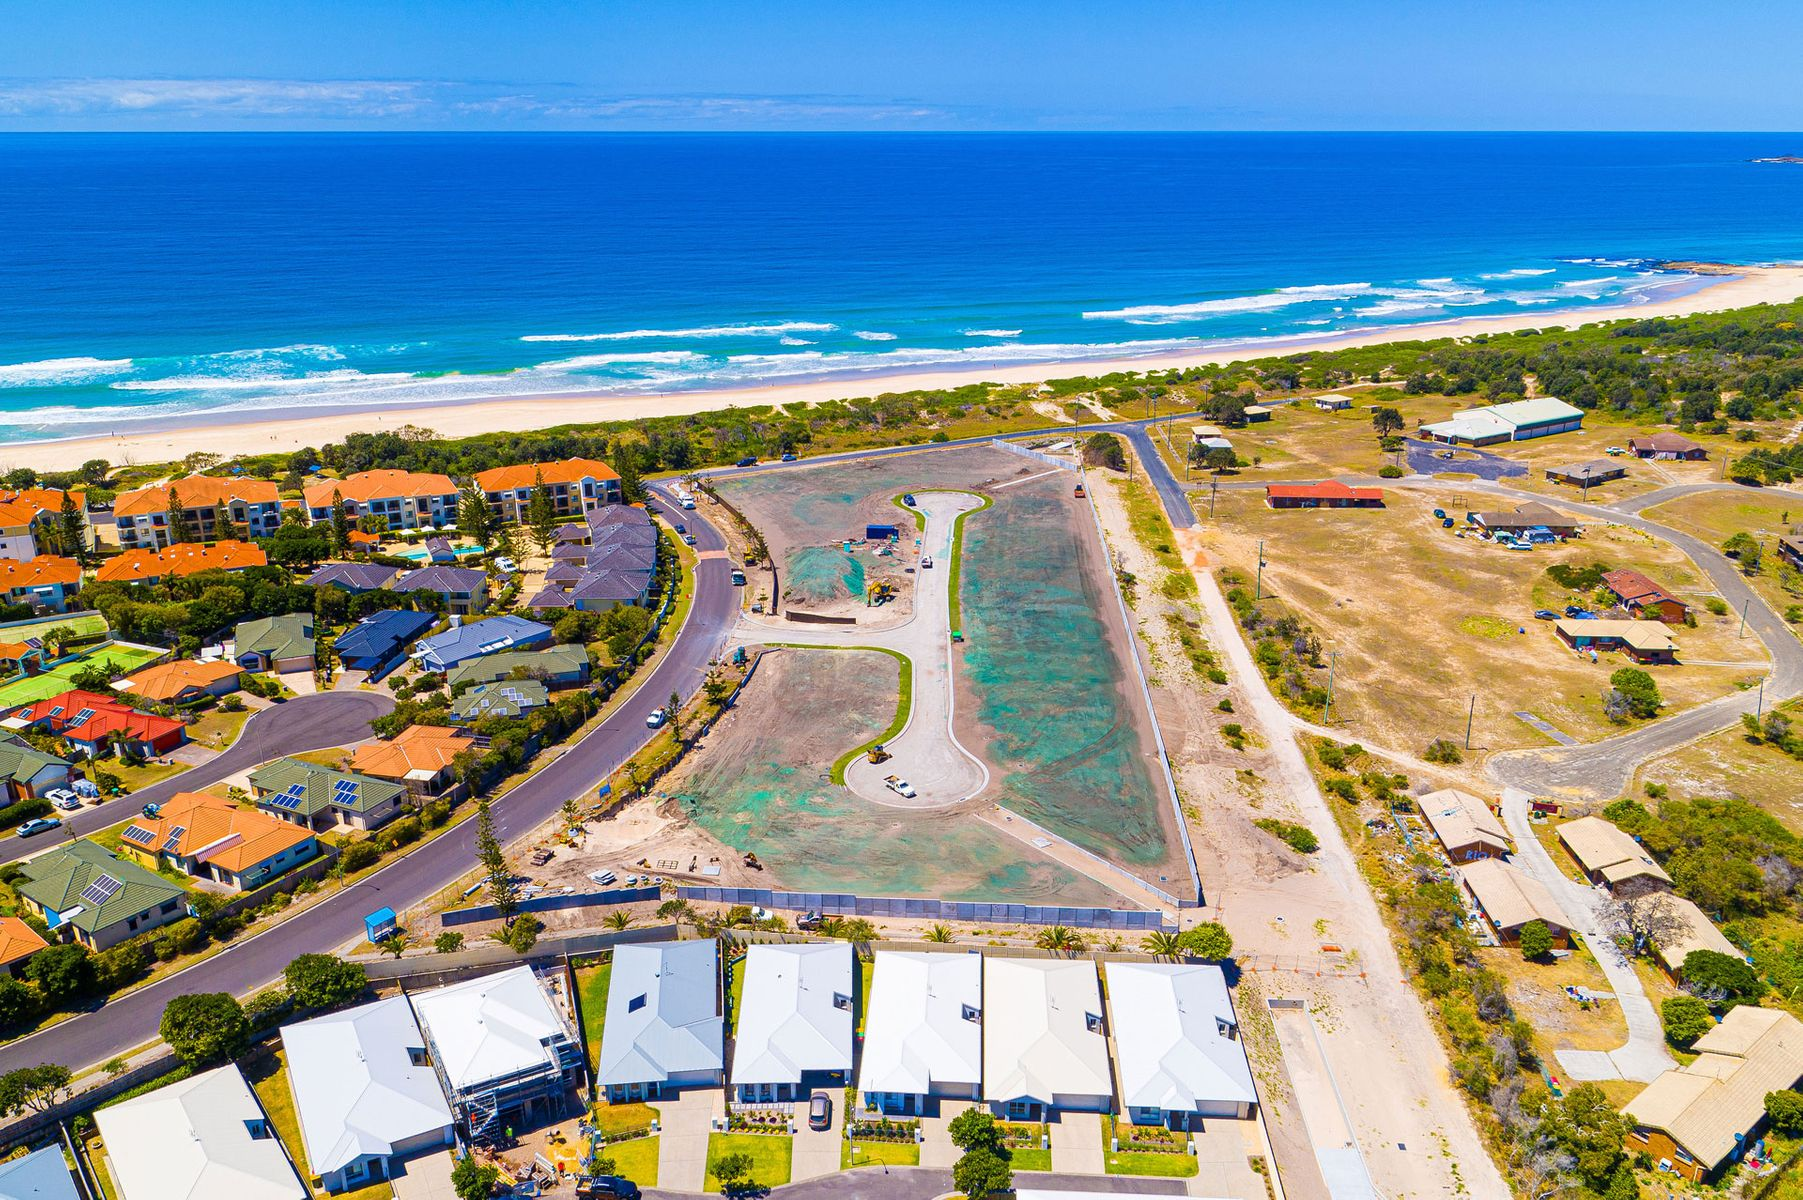 Lot 4 The Dunes Estate River Street, Yamba, NSW 2464